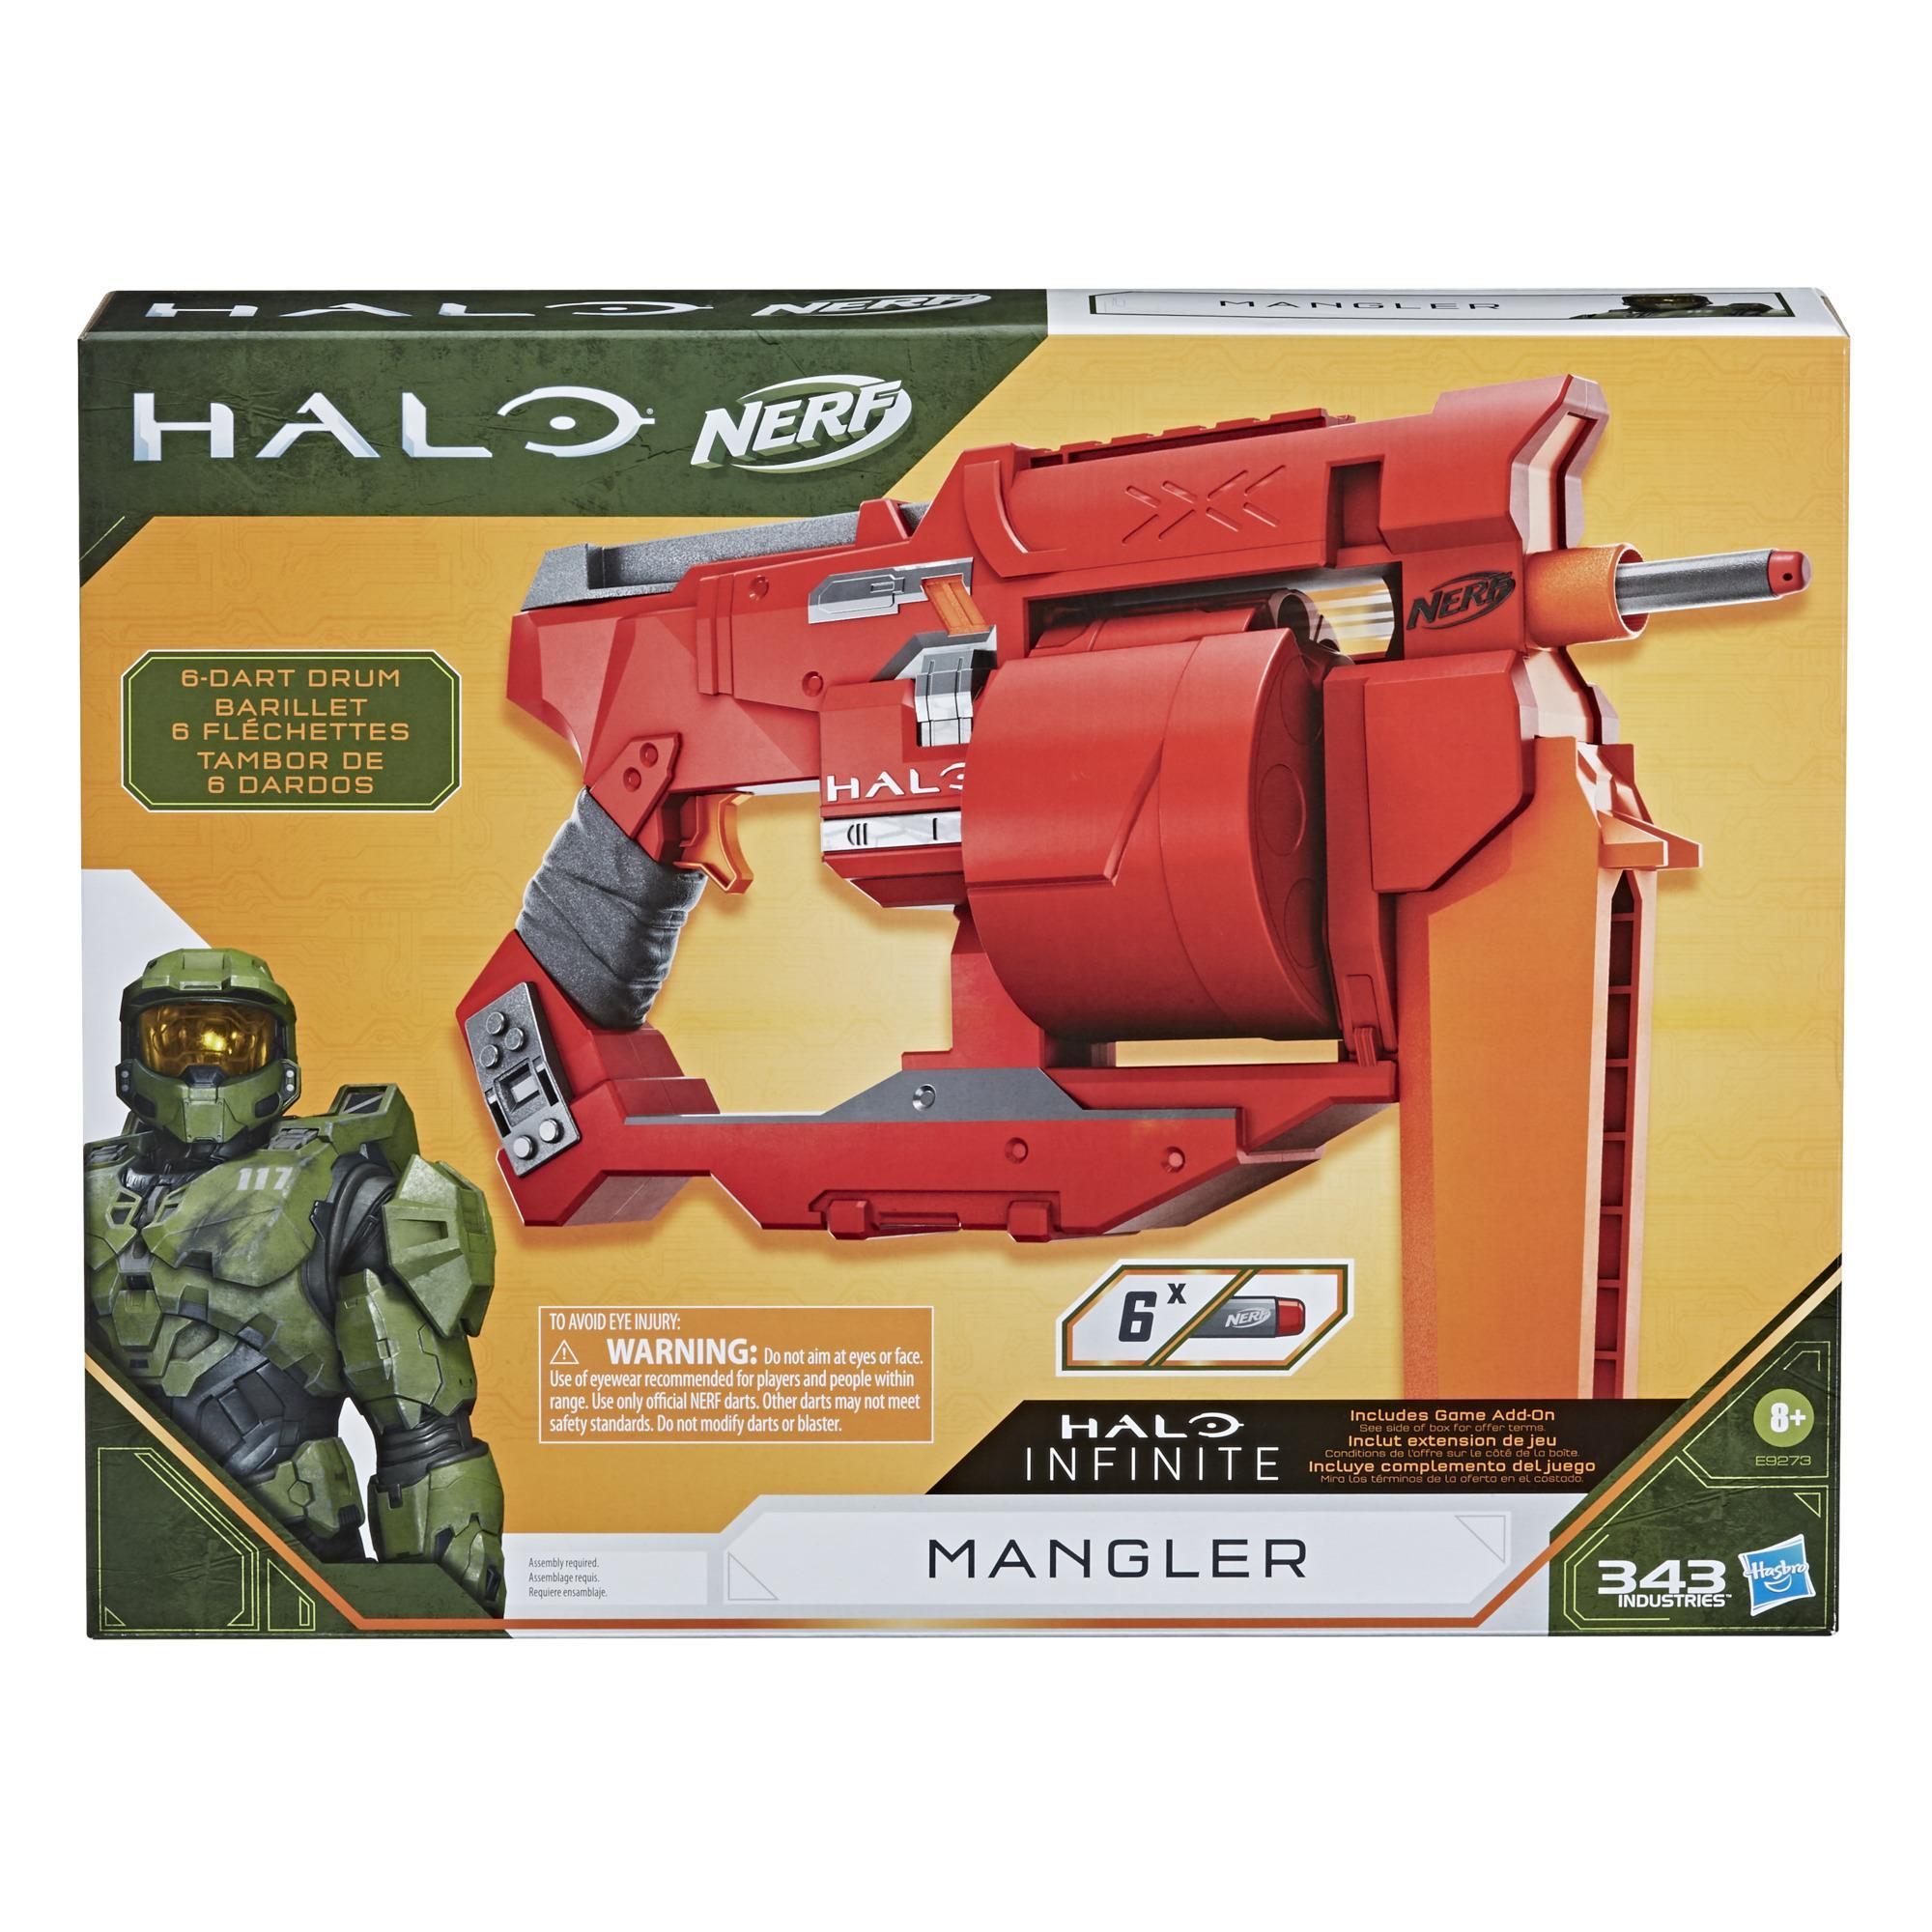 Nerf Halo Mangler Dart Blaster – Spannschlitten, 6-Dart Rotationstrommel – enthält 6 Nerf Elite Darts